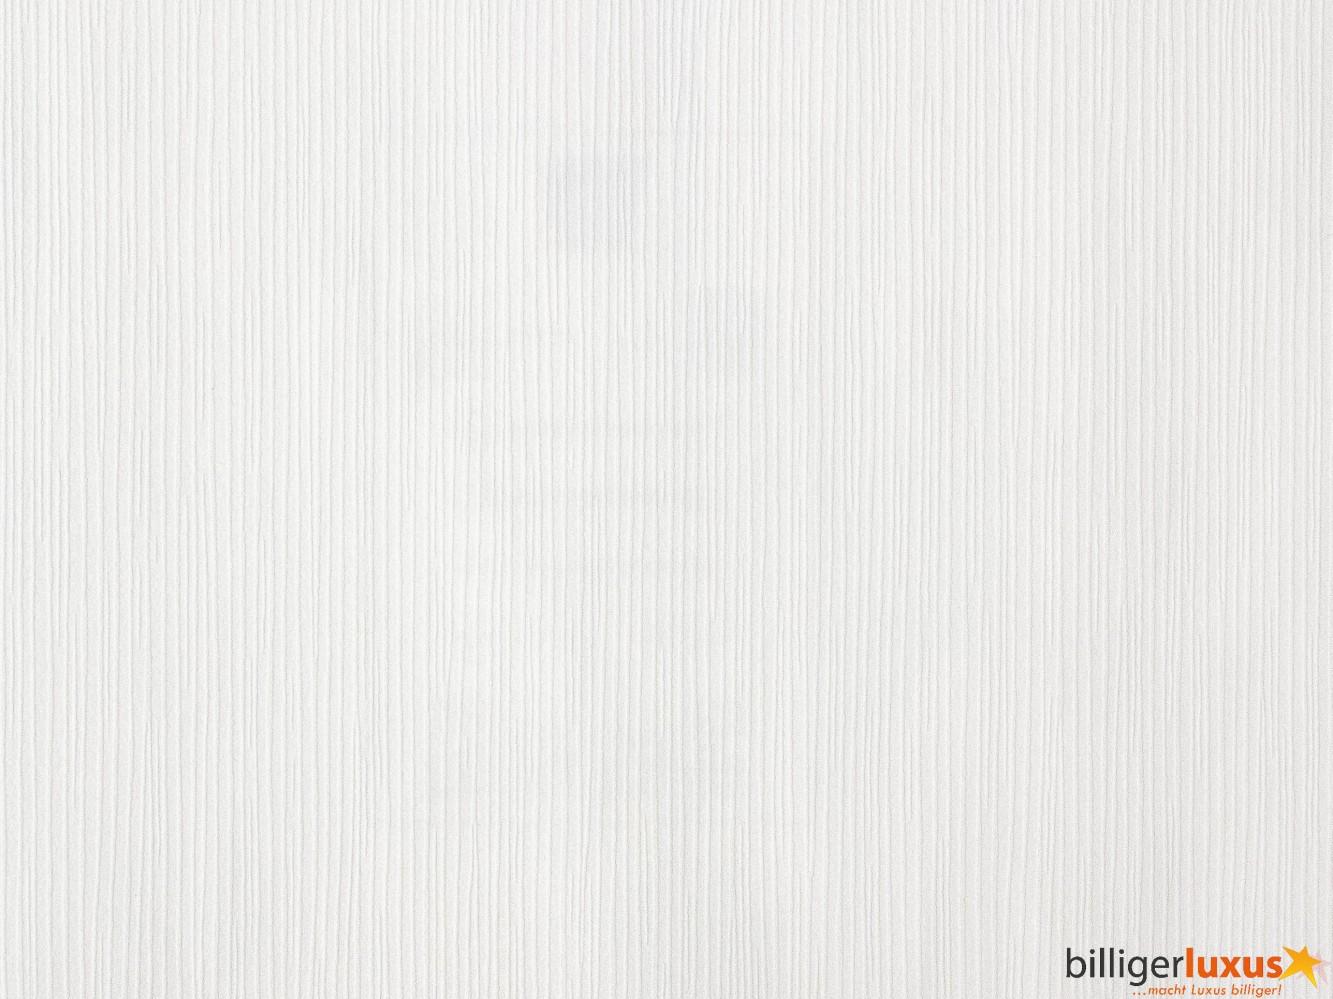 Free Download White Plain Wallpaper Desktop Backgrounds